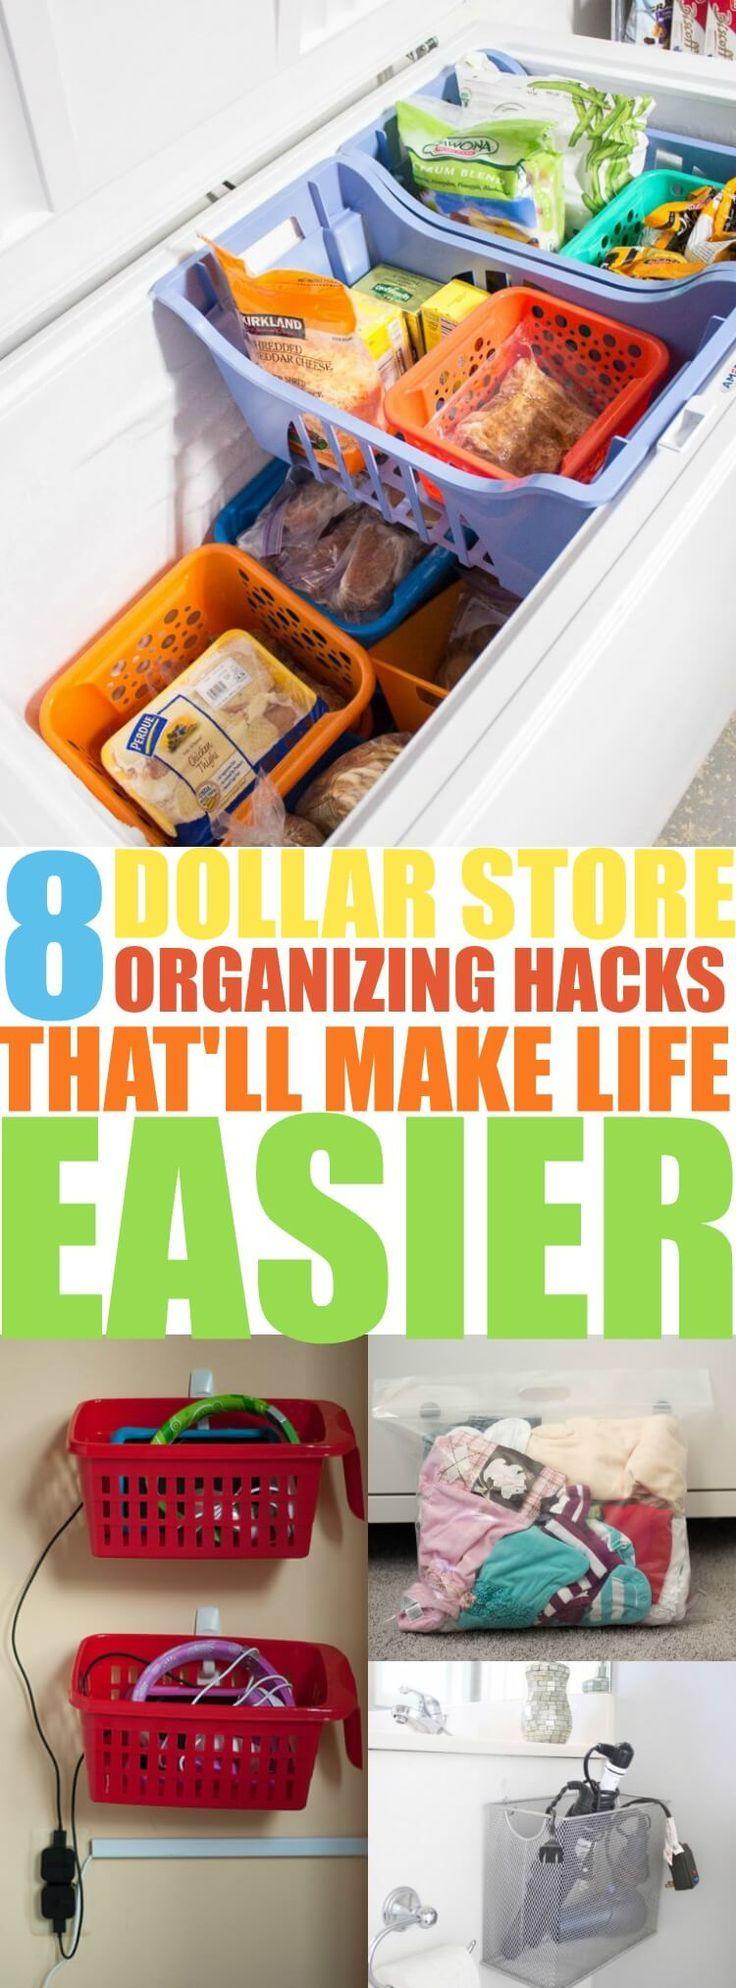 8 Dollar Store Organizing Hacks That'll Turn You Into An Organizing Genius